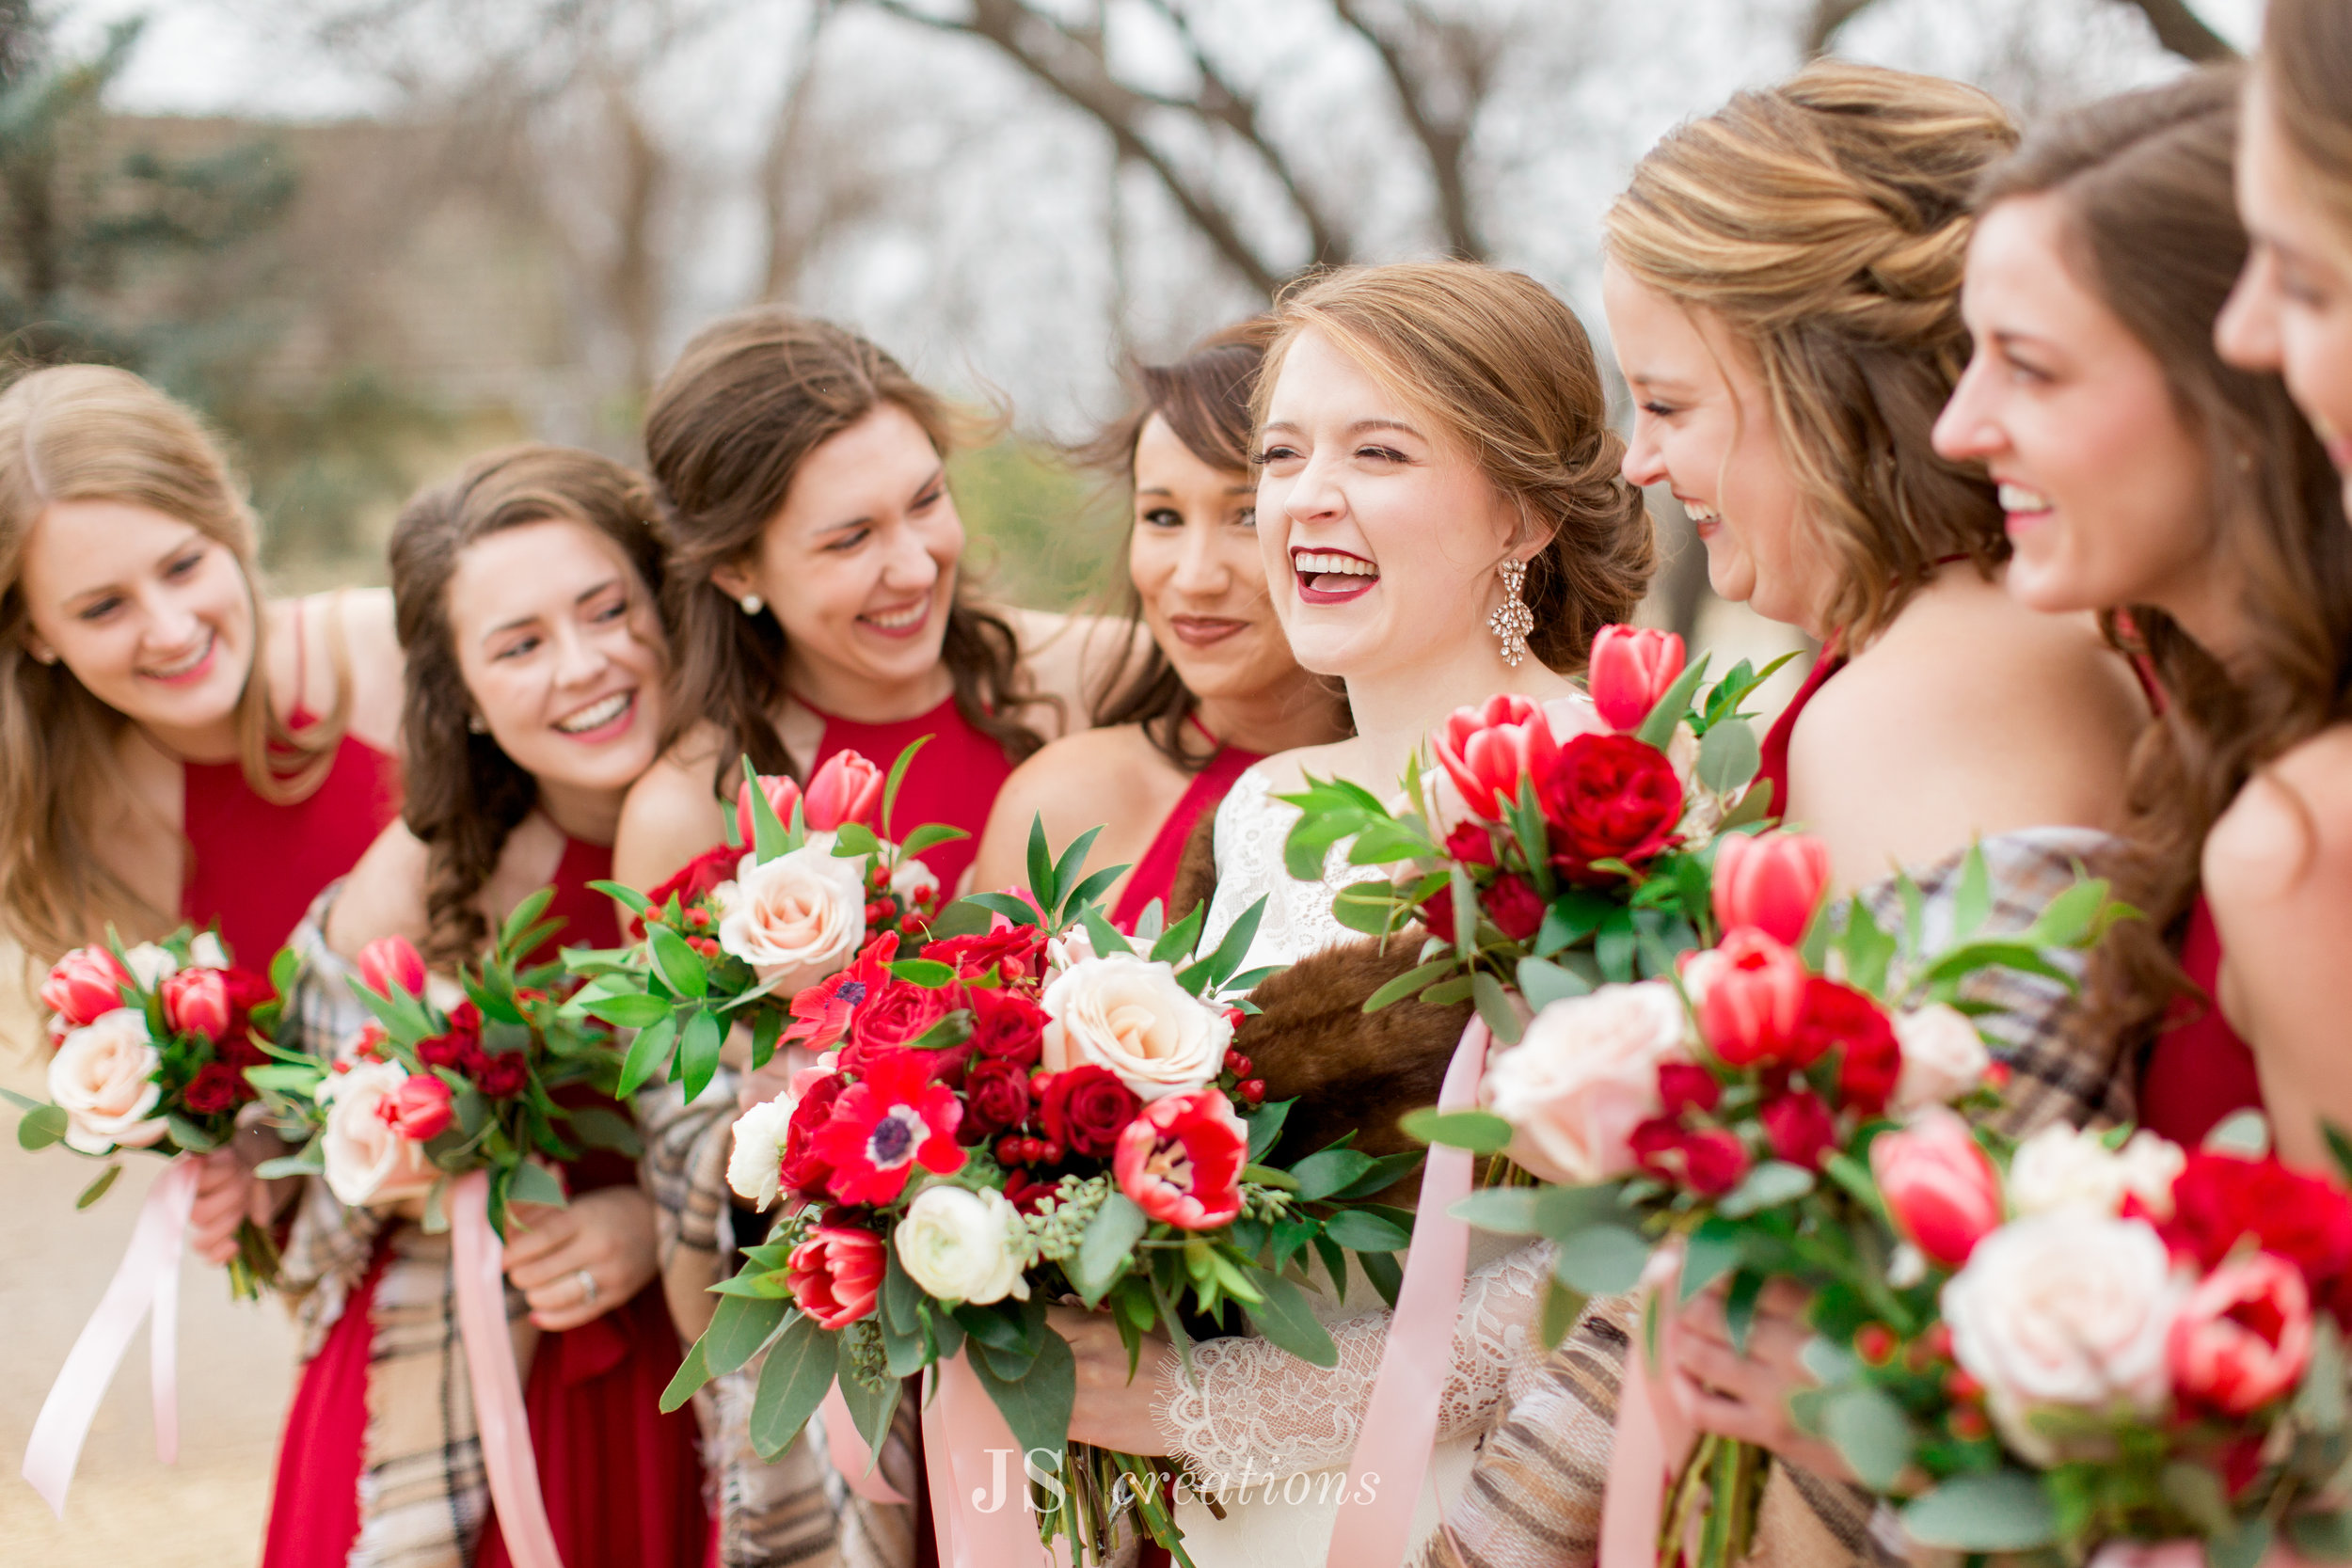 JSCreations_Weddings-292.jpg